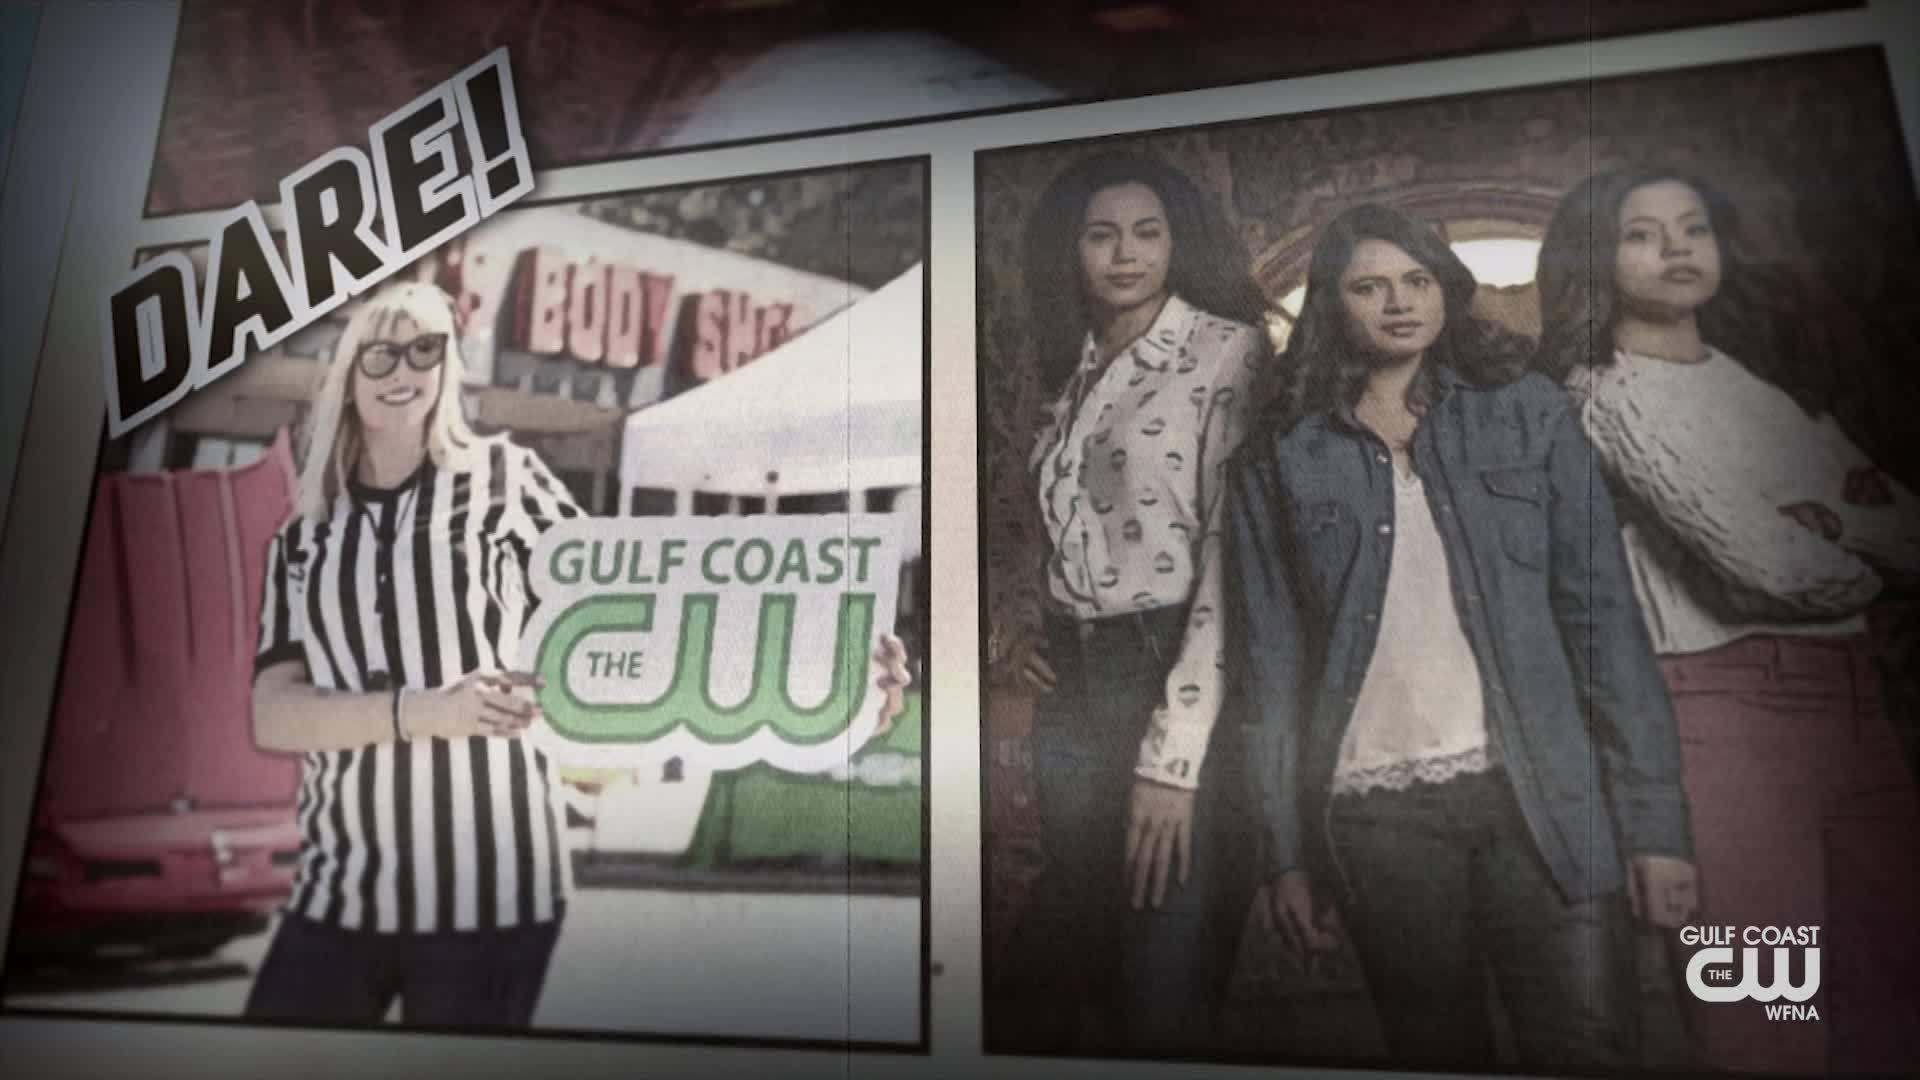 The Gulf Coast CW   Dare To Defy